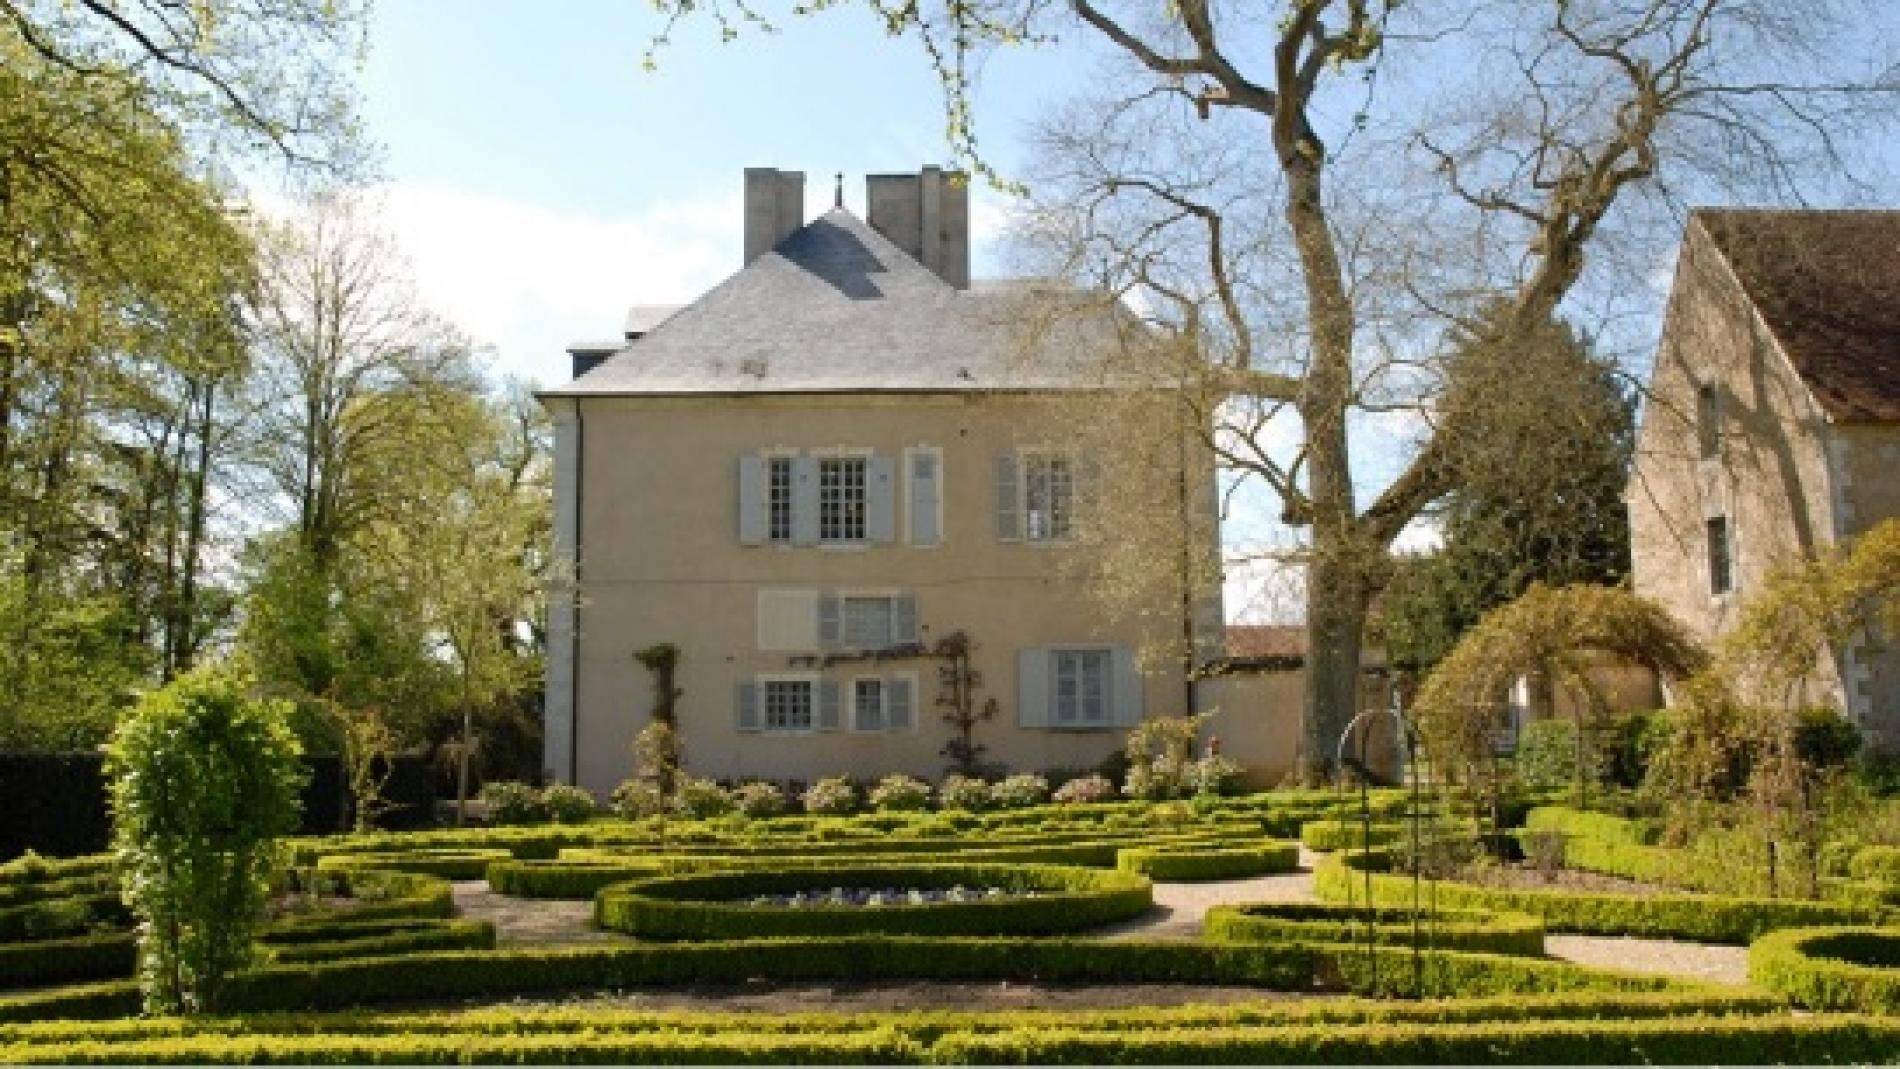 The George SAND House